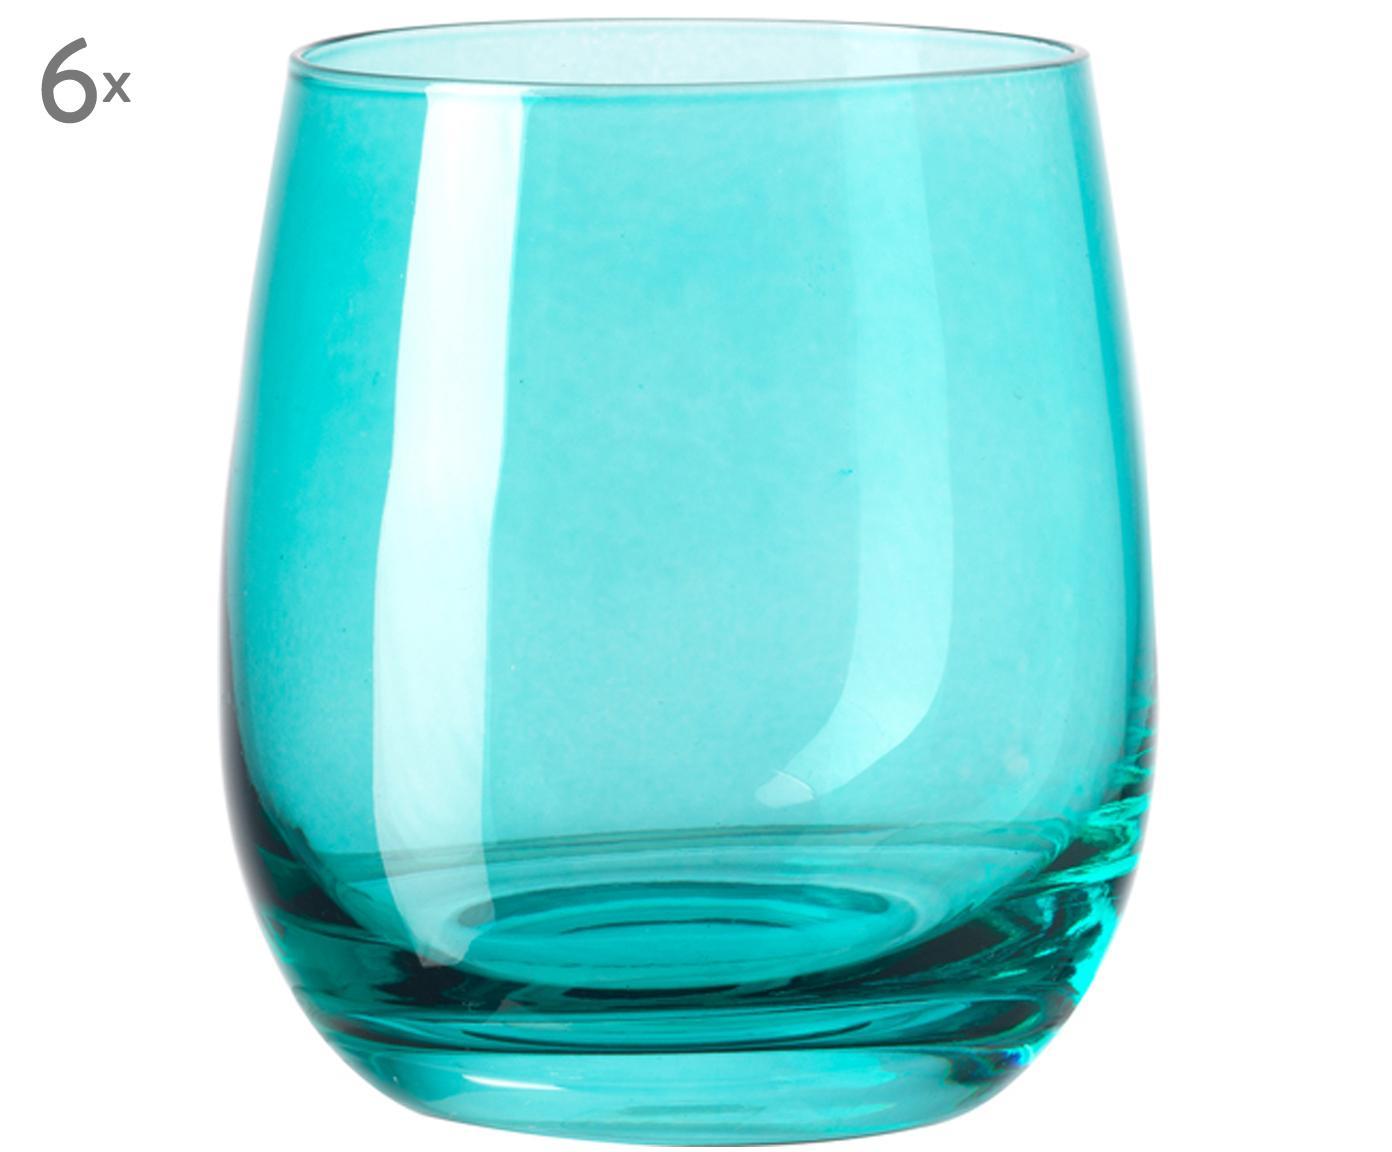 Wassergläser Sora, 6 Stück, Glas, Türkis, Ø 8 x H 10 cm